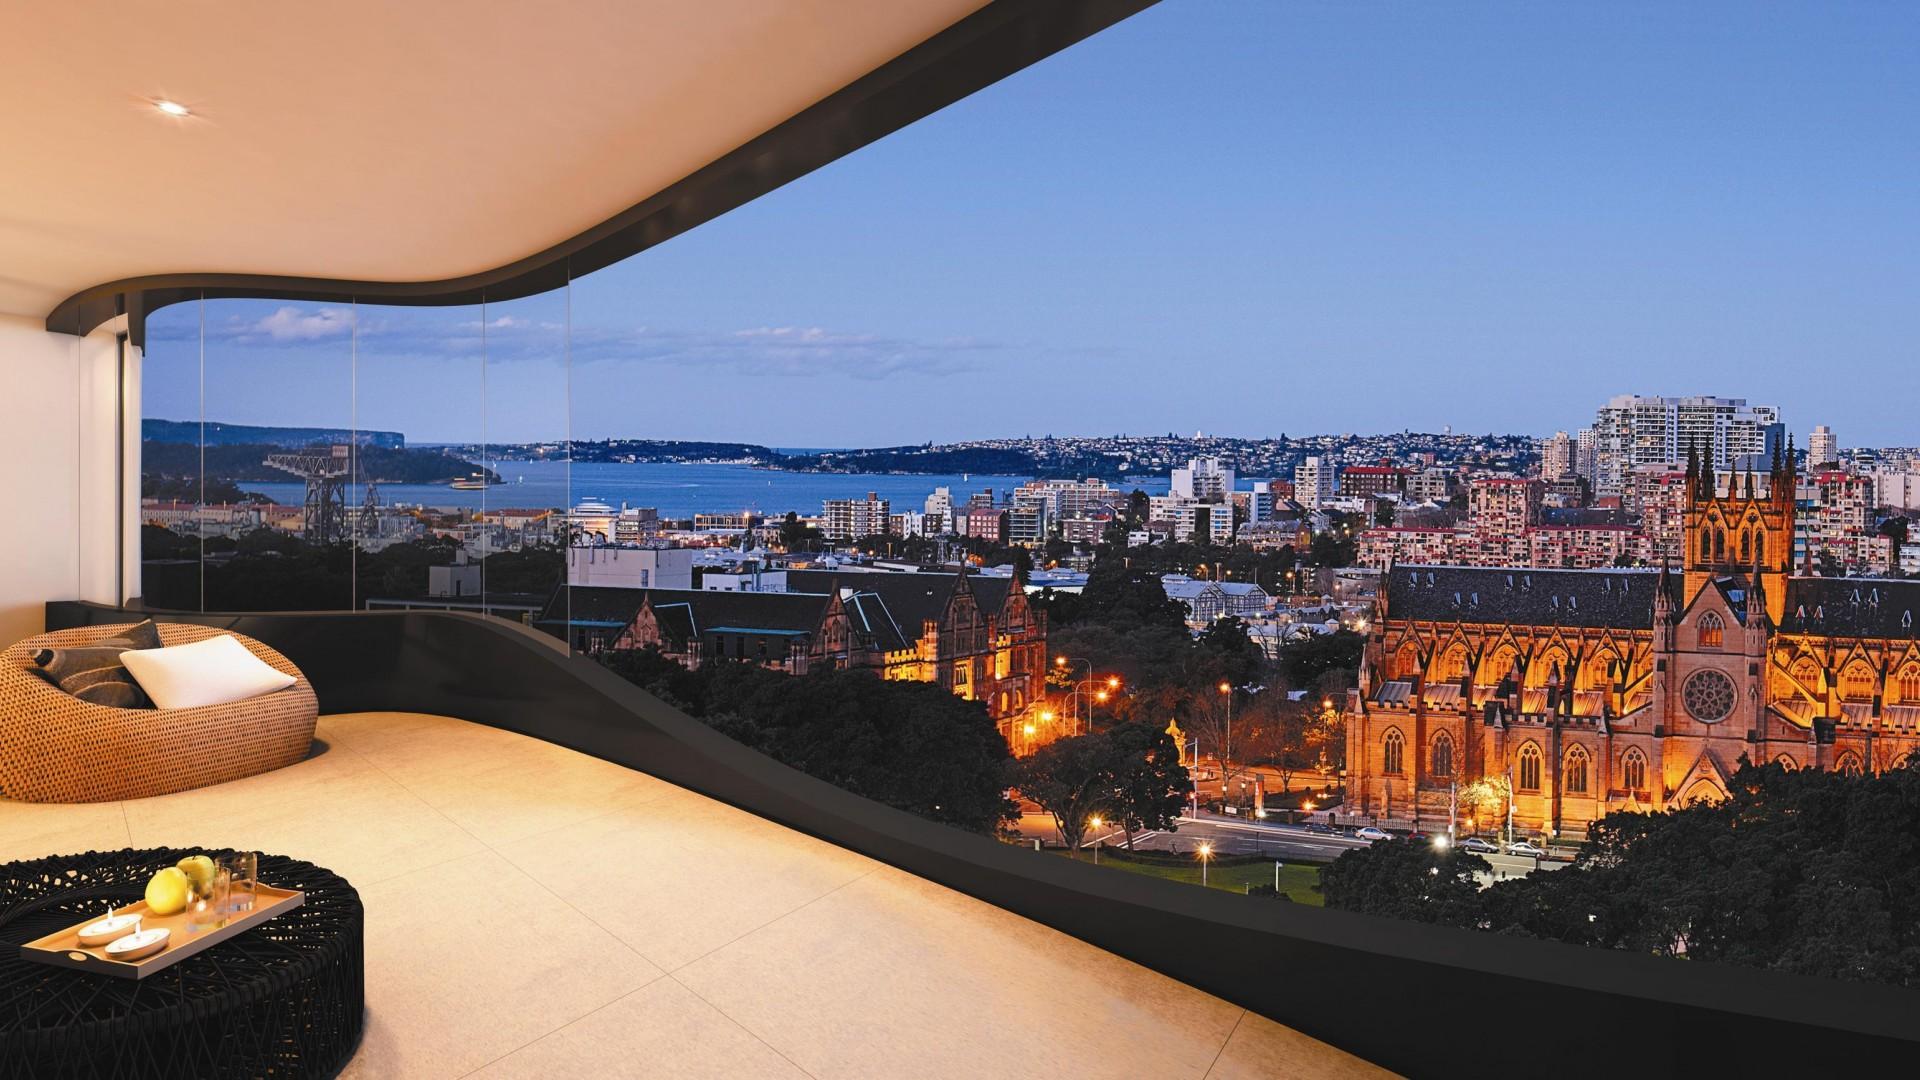 balcony view wallpaper - photo #39